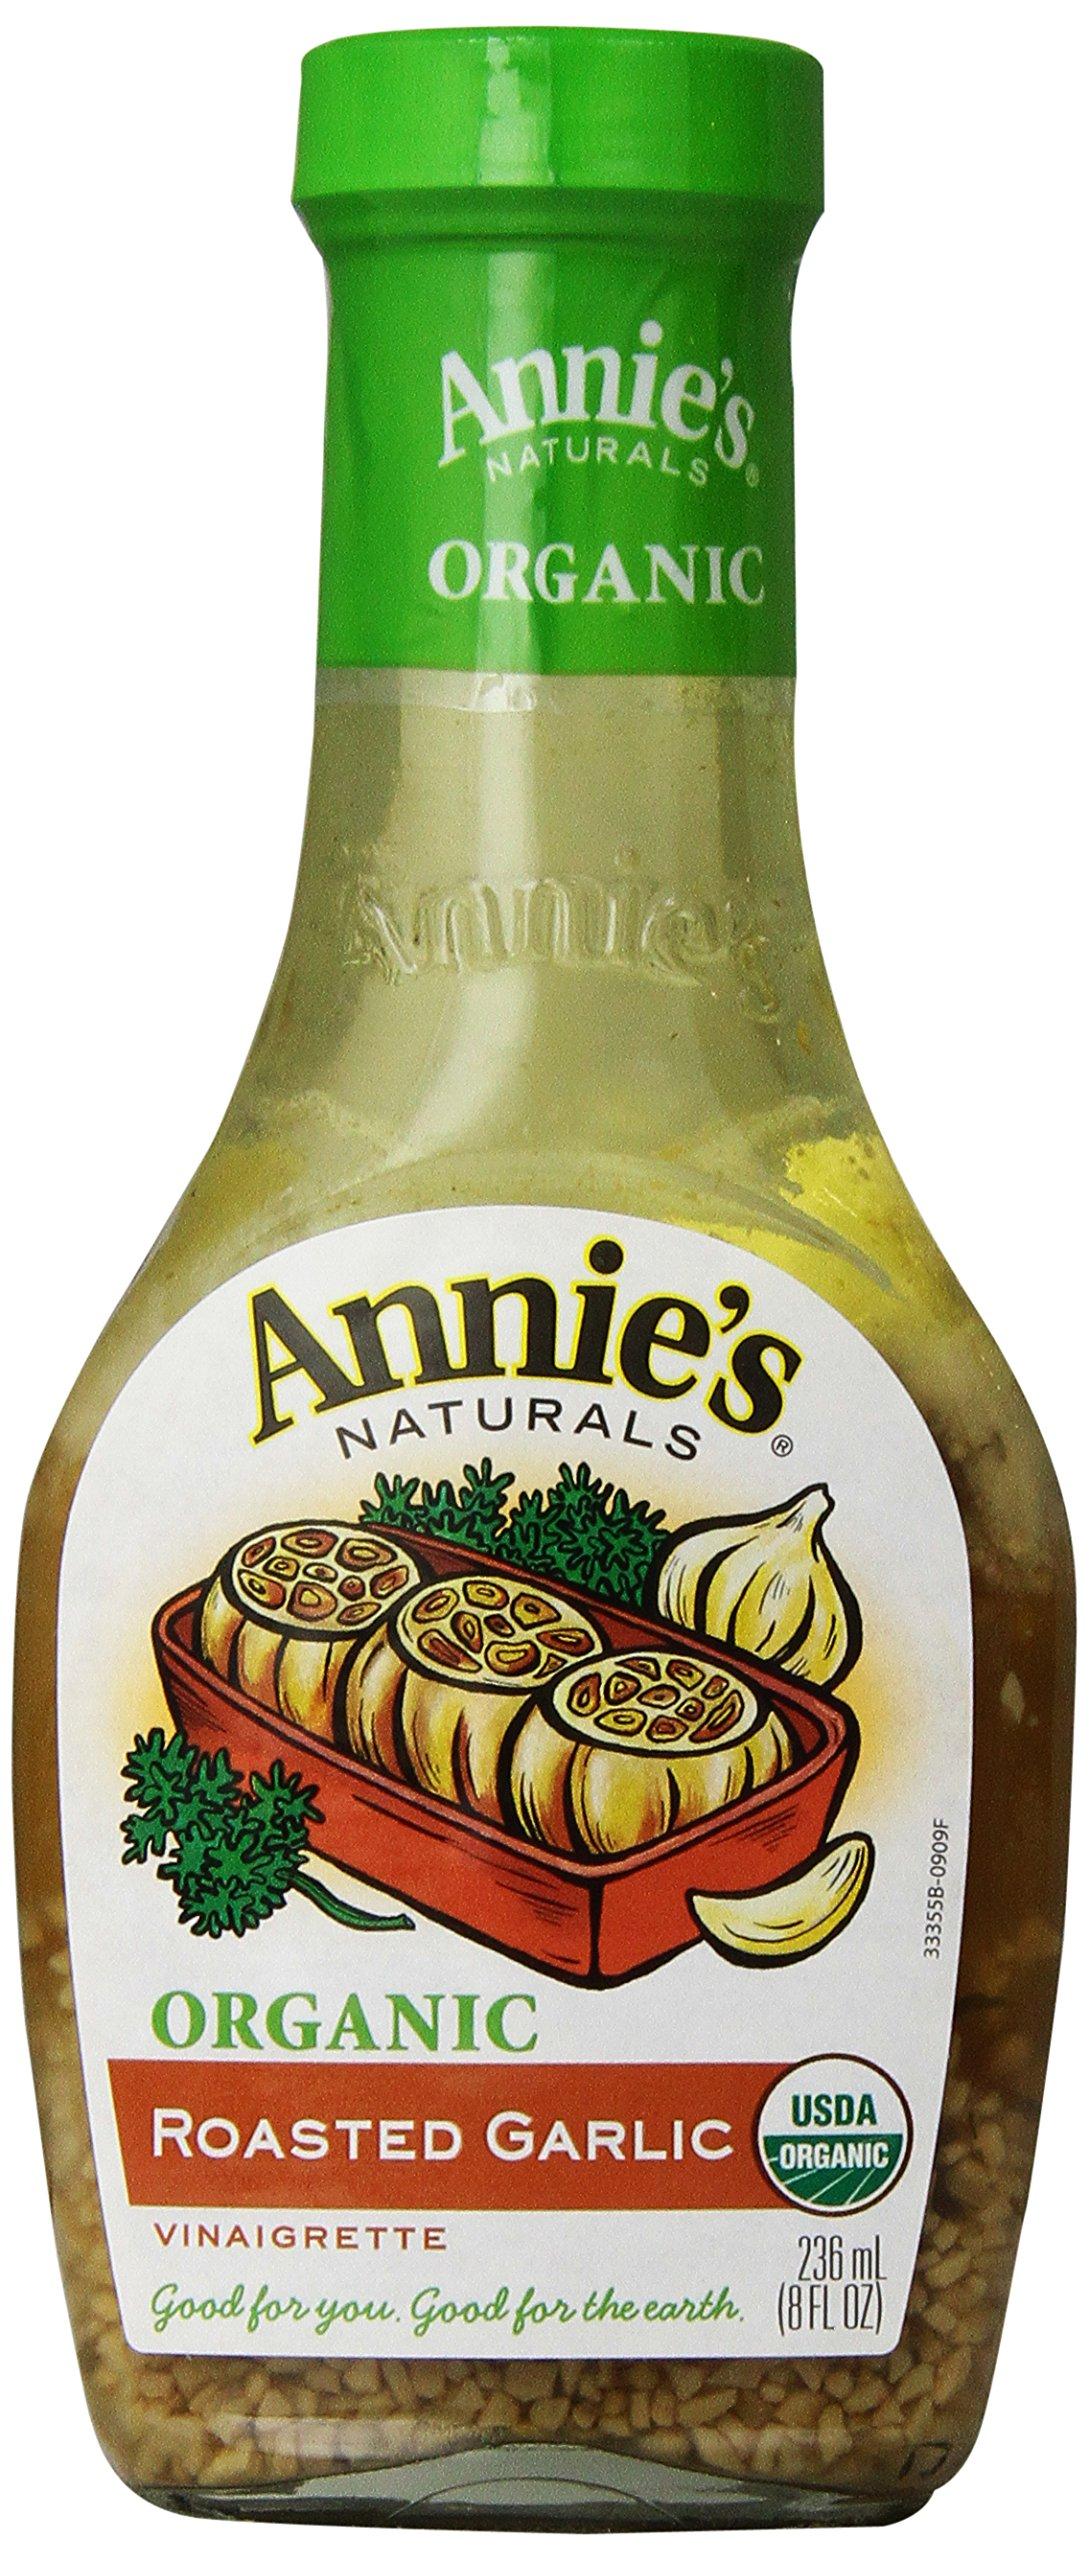 Annie's Organic Gluten Free Roasted Garlic Vinaigrette Dressing 8 fl oz Bottle